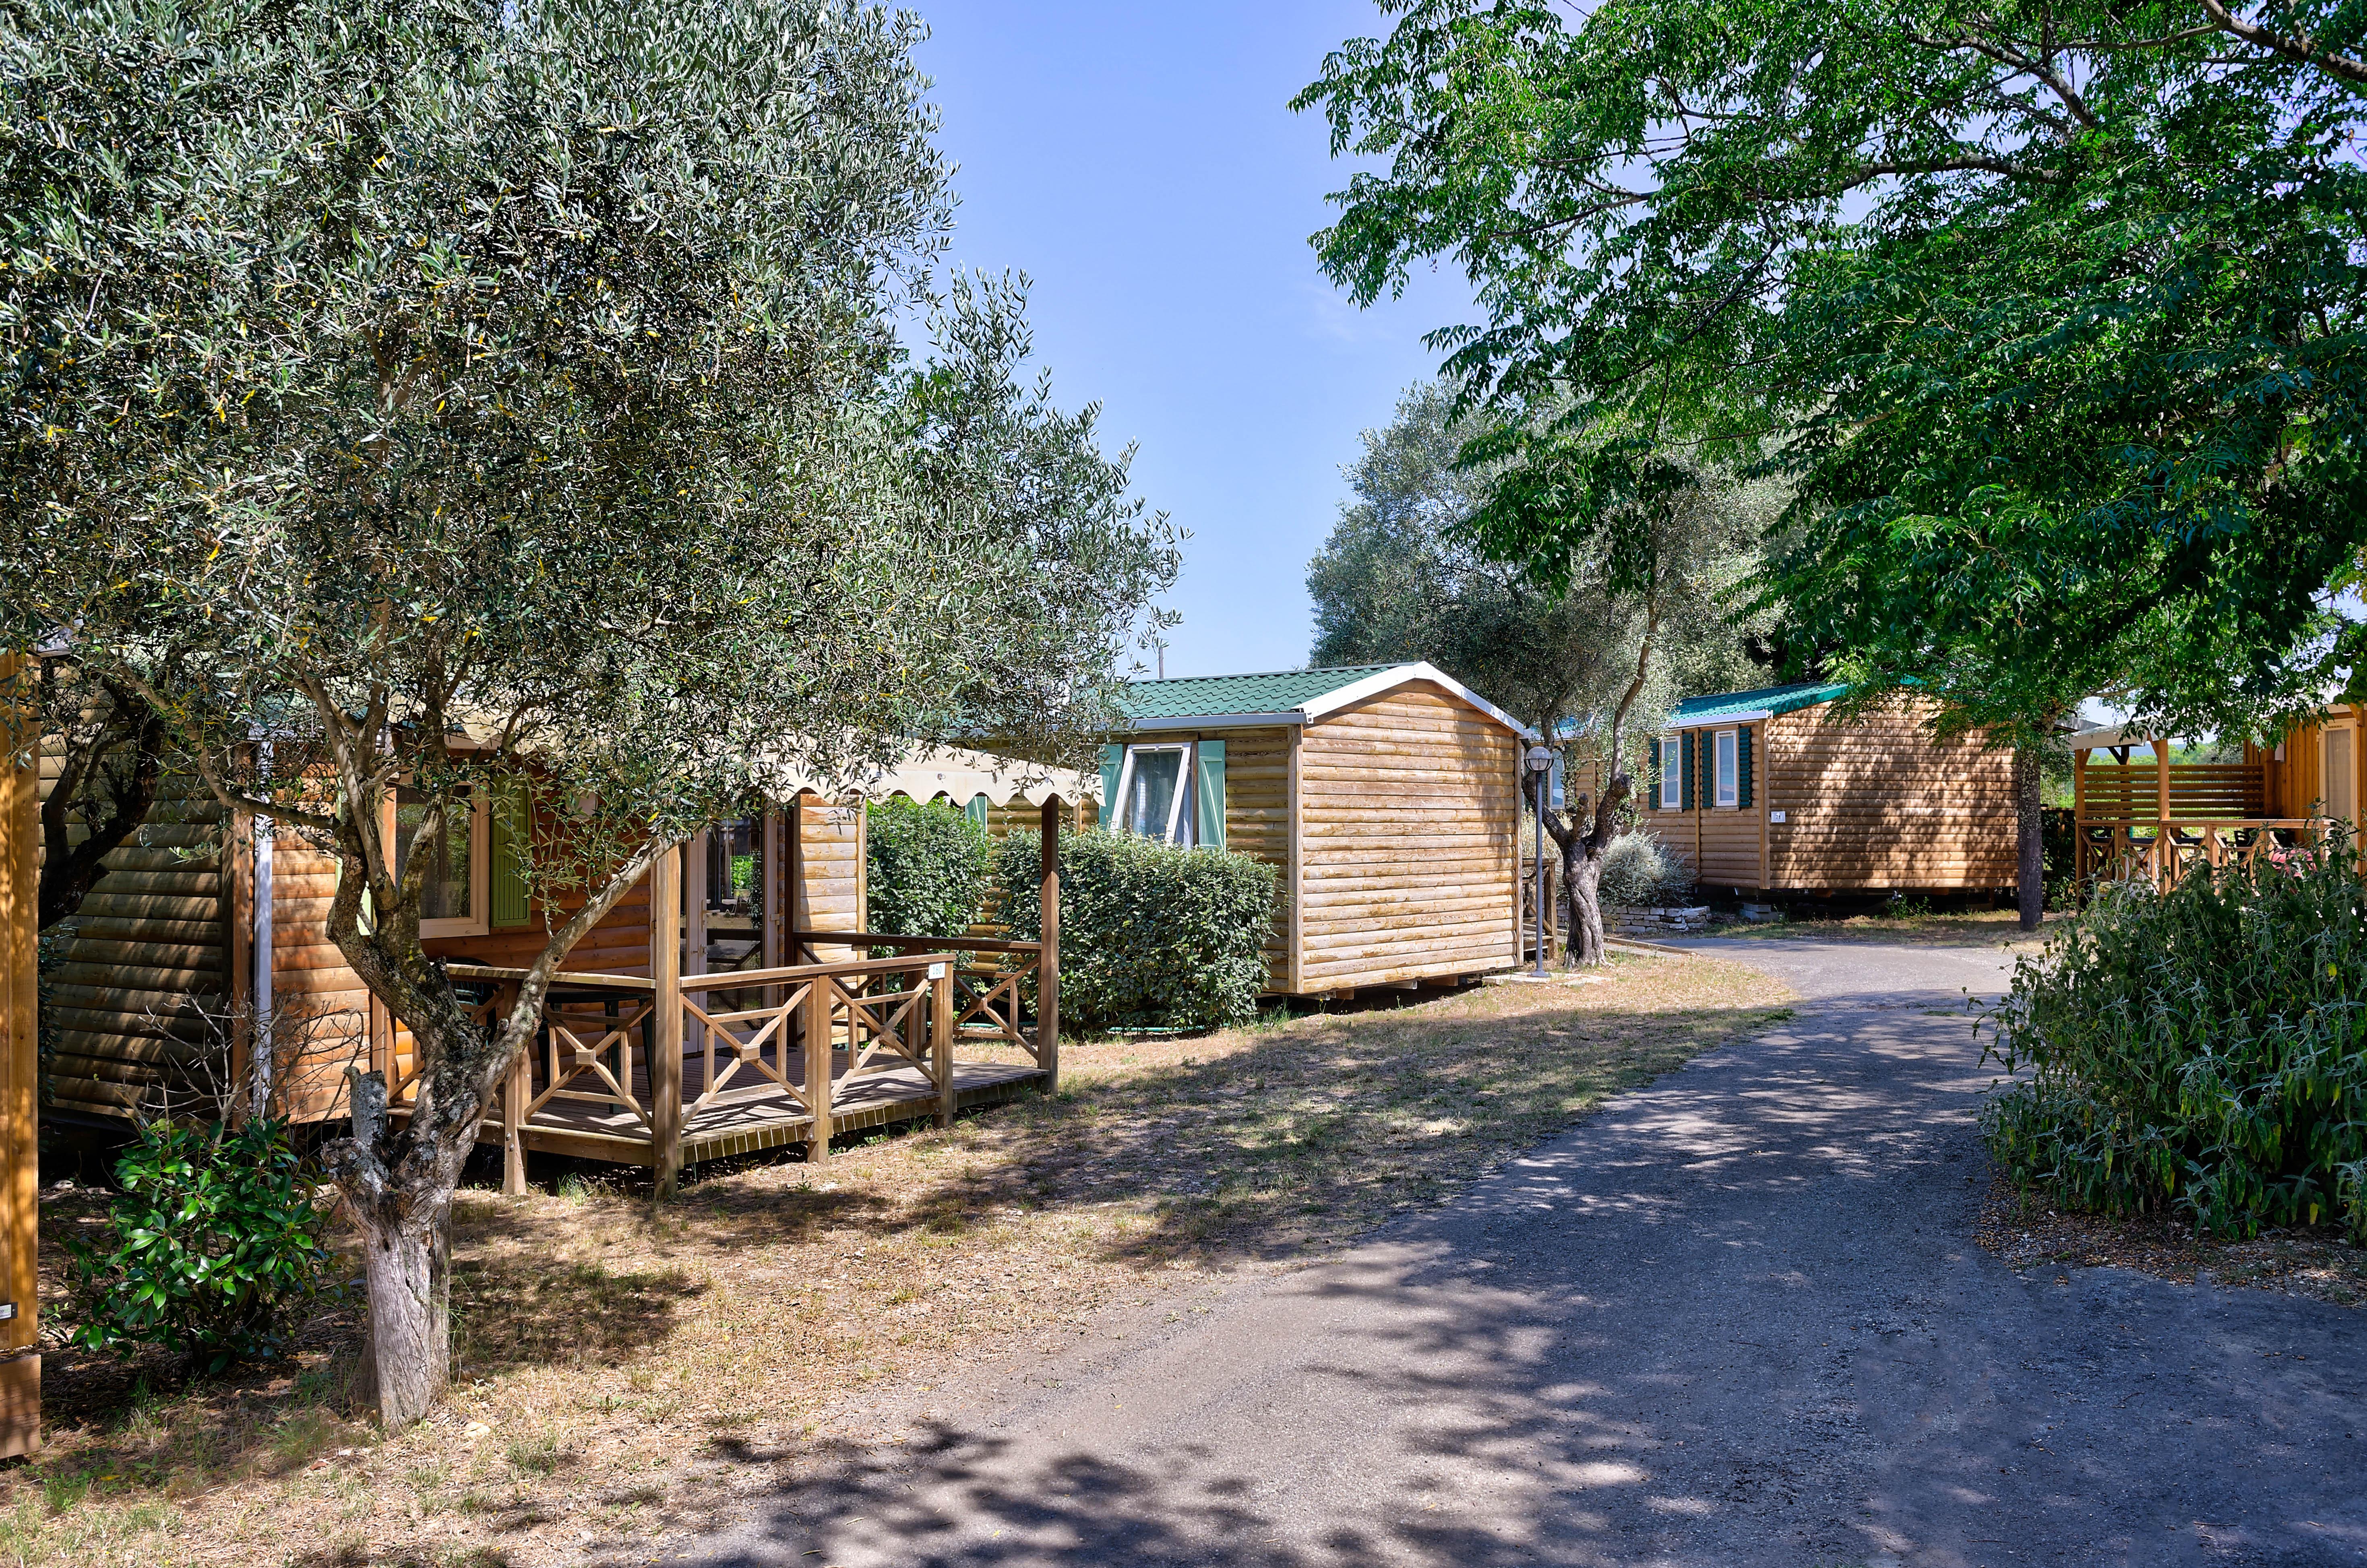 096_Camping_Gorges_du_Gardon_Capfun